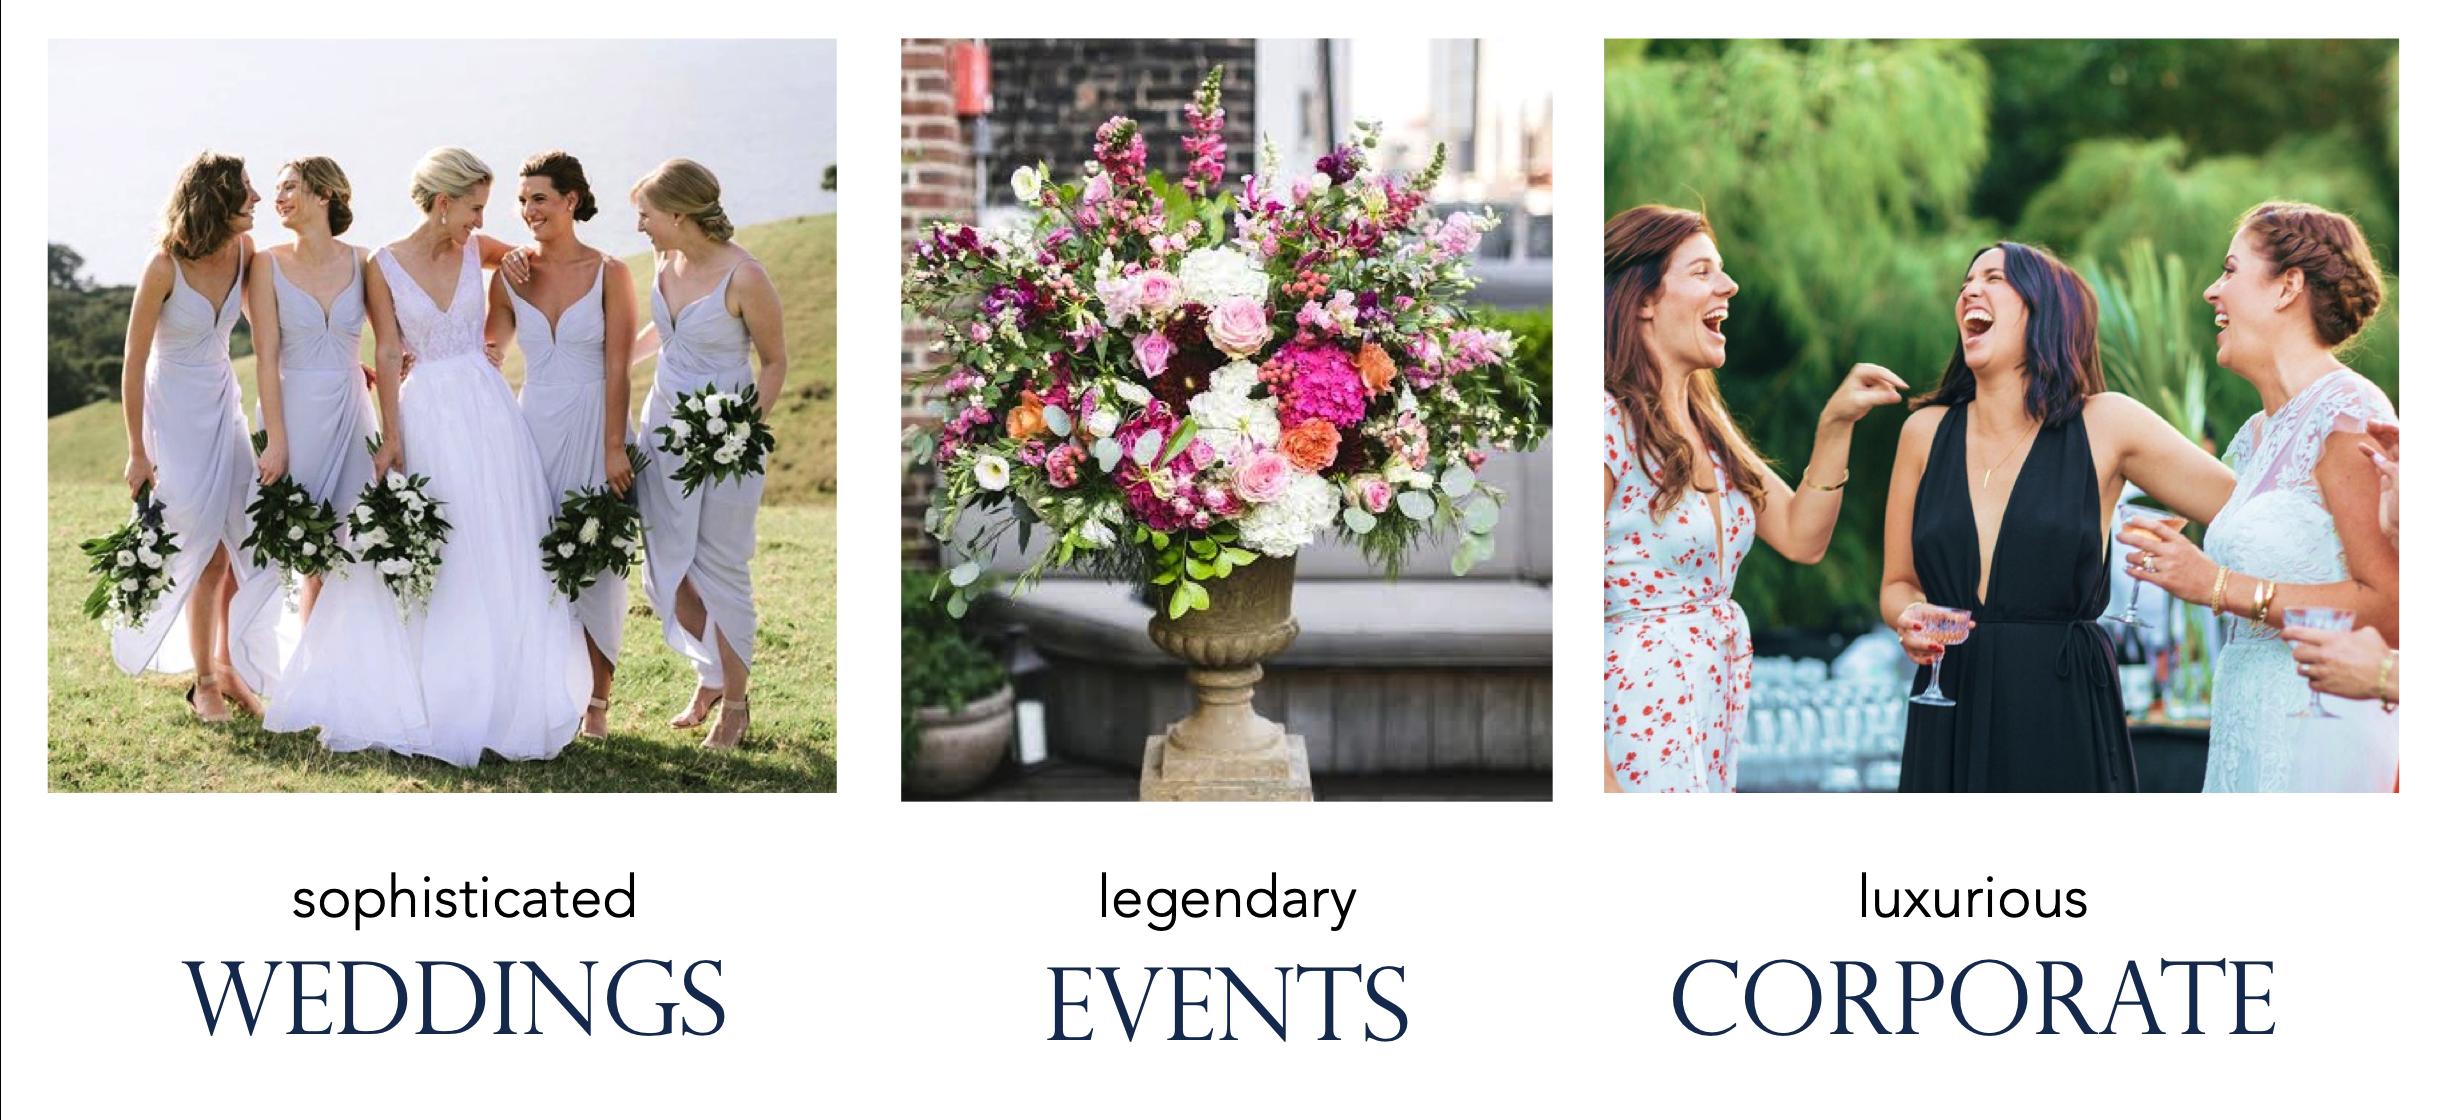 bloom1contact-angies-el-paso-79912-tx-flower-distributor-2-we-make-el-paso-bloom-angies-floral-designs-el-paso-texas-floral-flowershop-florist-texas-79912-highend-sophisticated-elegant-luxury.png